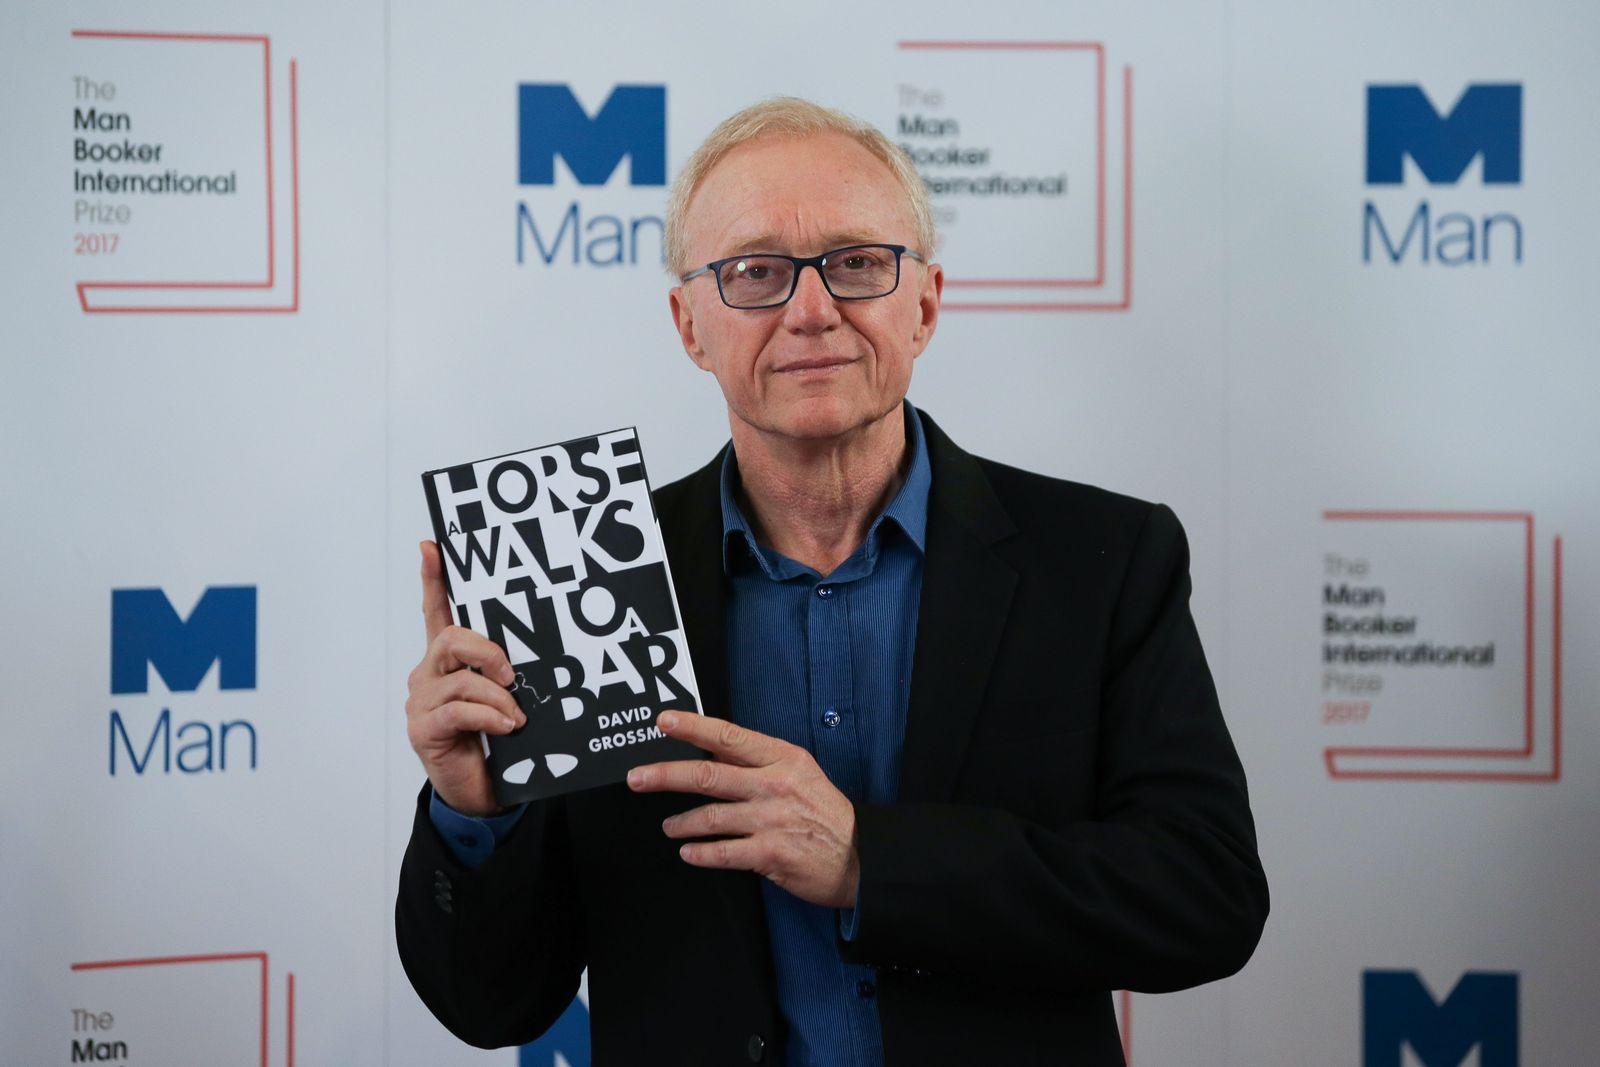 BRITAIN-LITERATURE-BOOKER-INTERNATIONAL